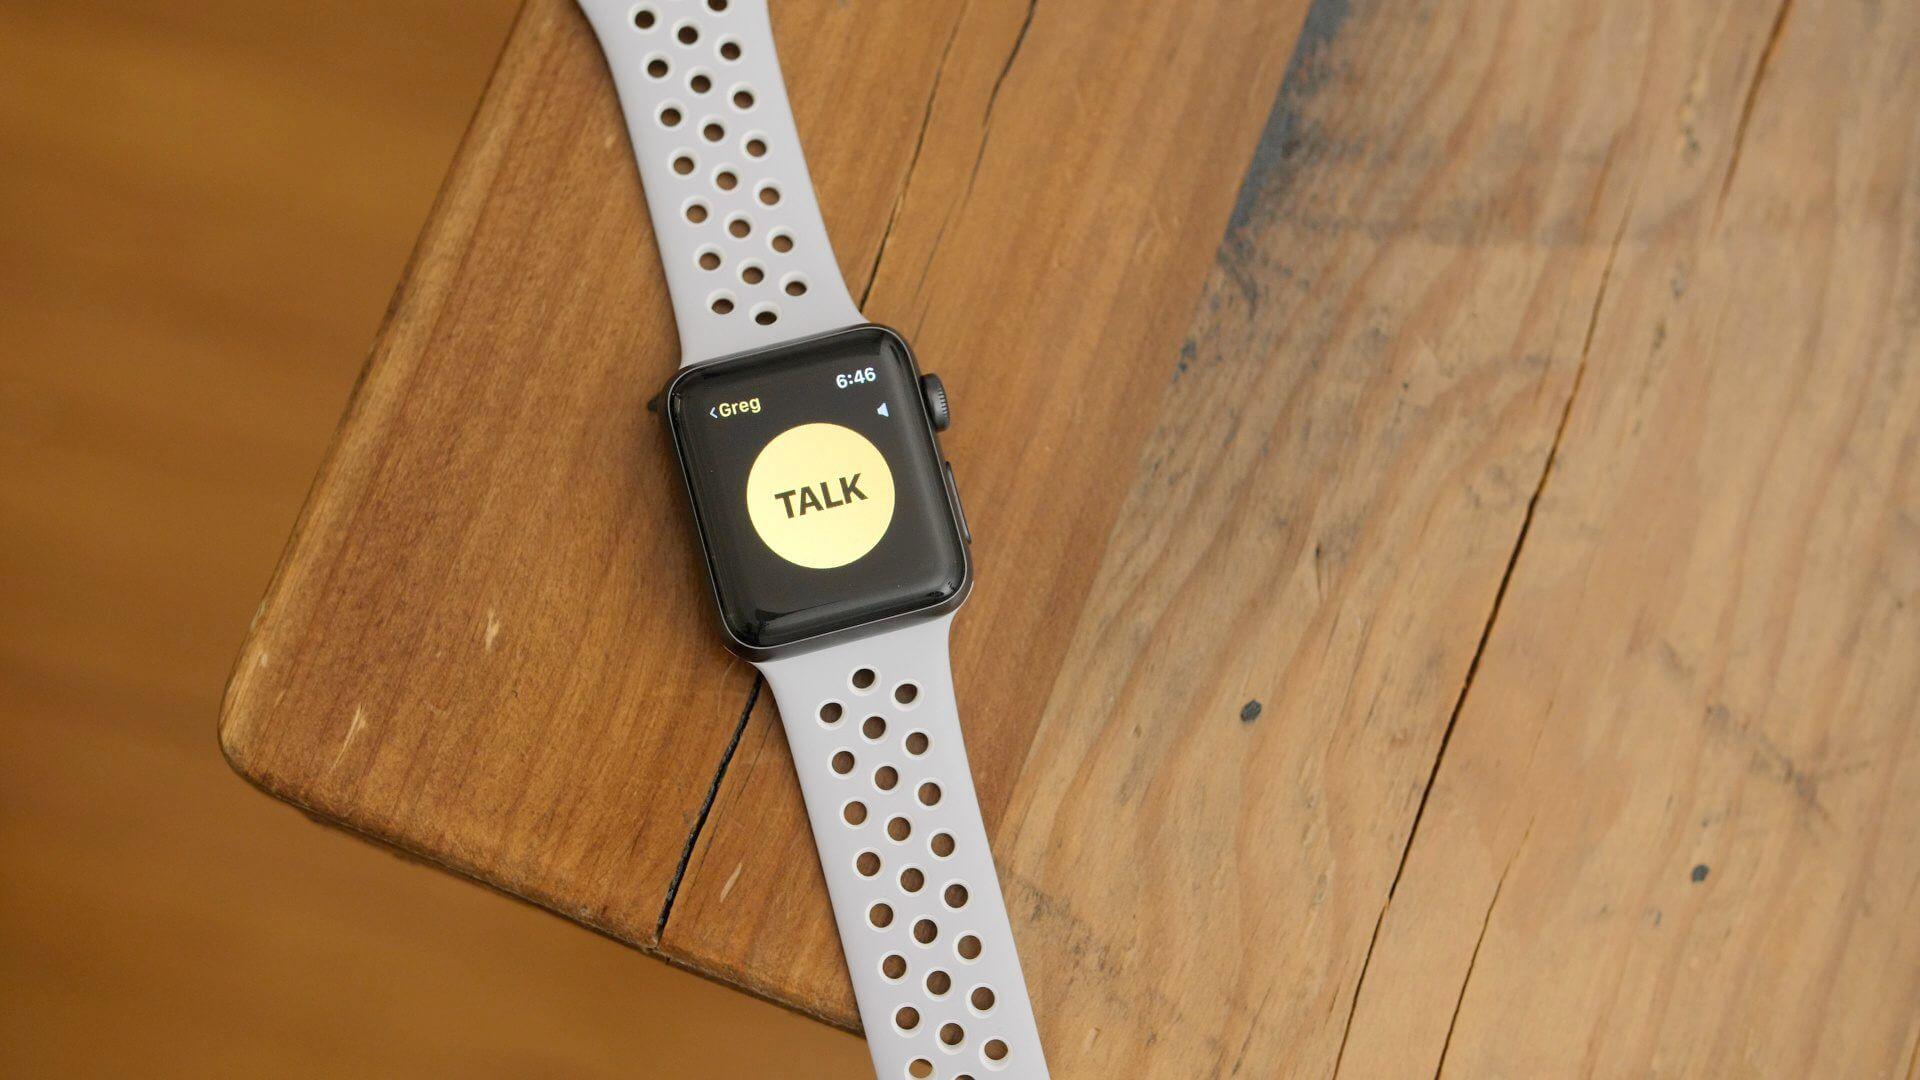 Как работает загадочная функция Walkie-Talkie на Apple Watch